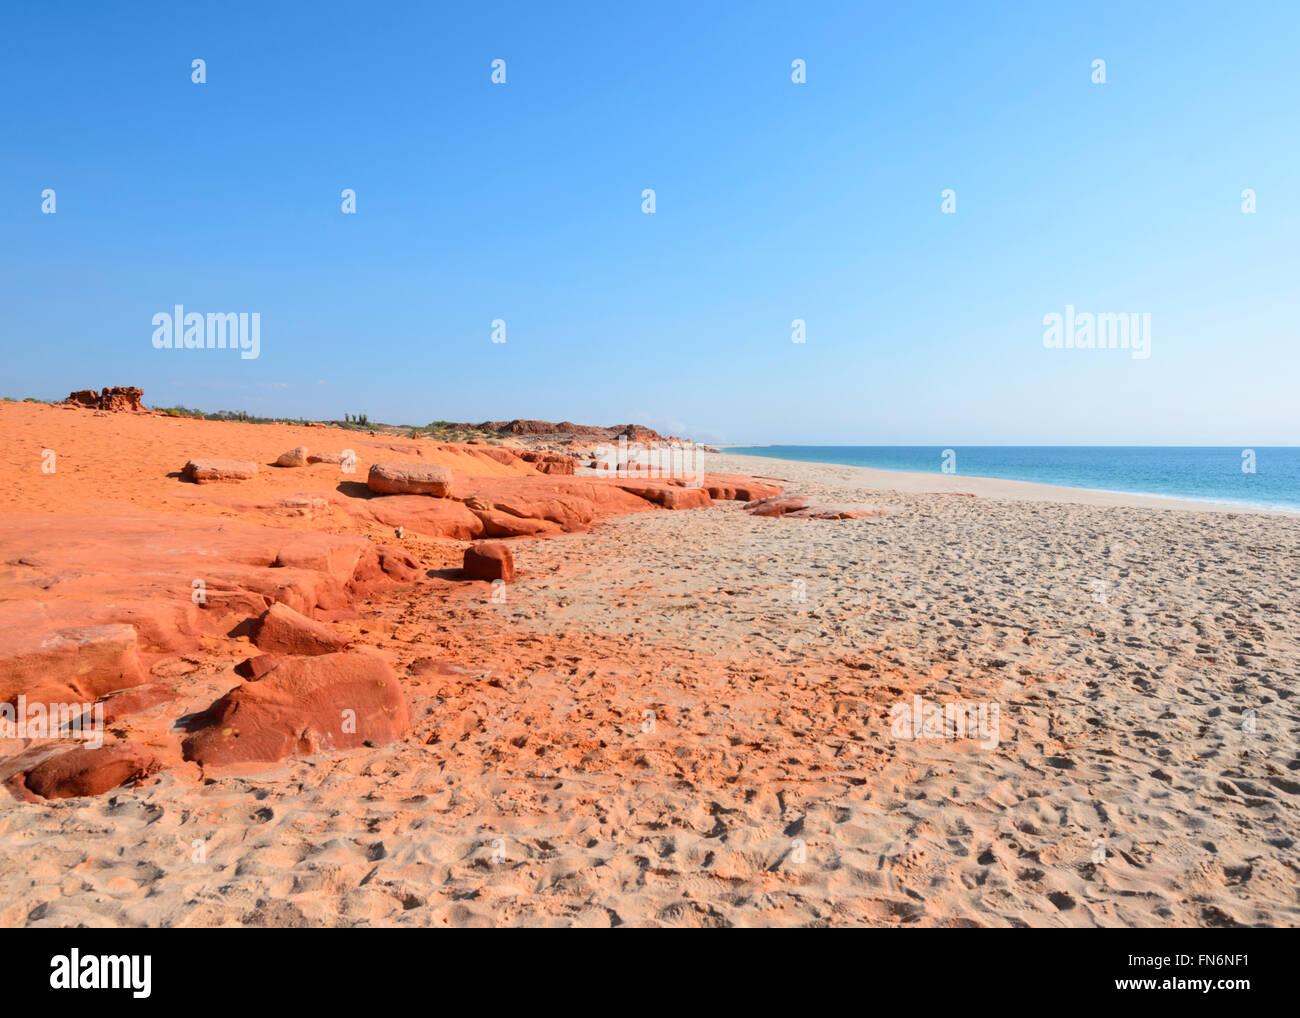 Cape Leveque, Dampier Peninsula Kimberley Region, Westaustralien, WA, Australien Stockbild